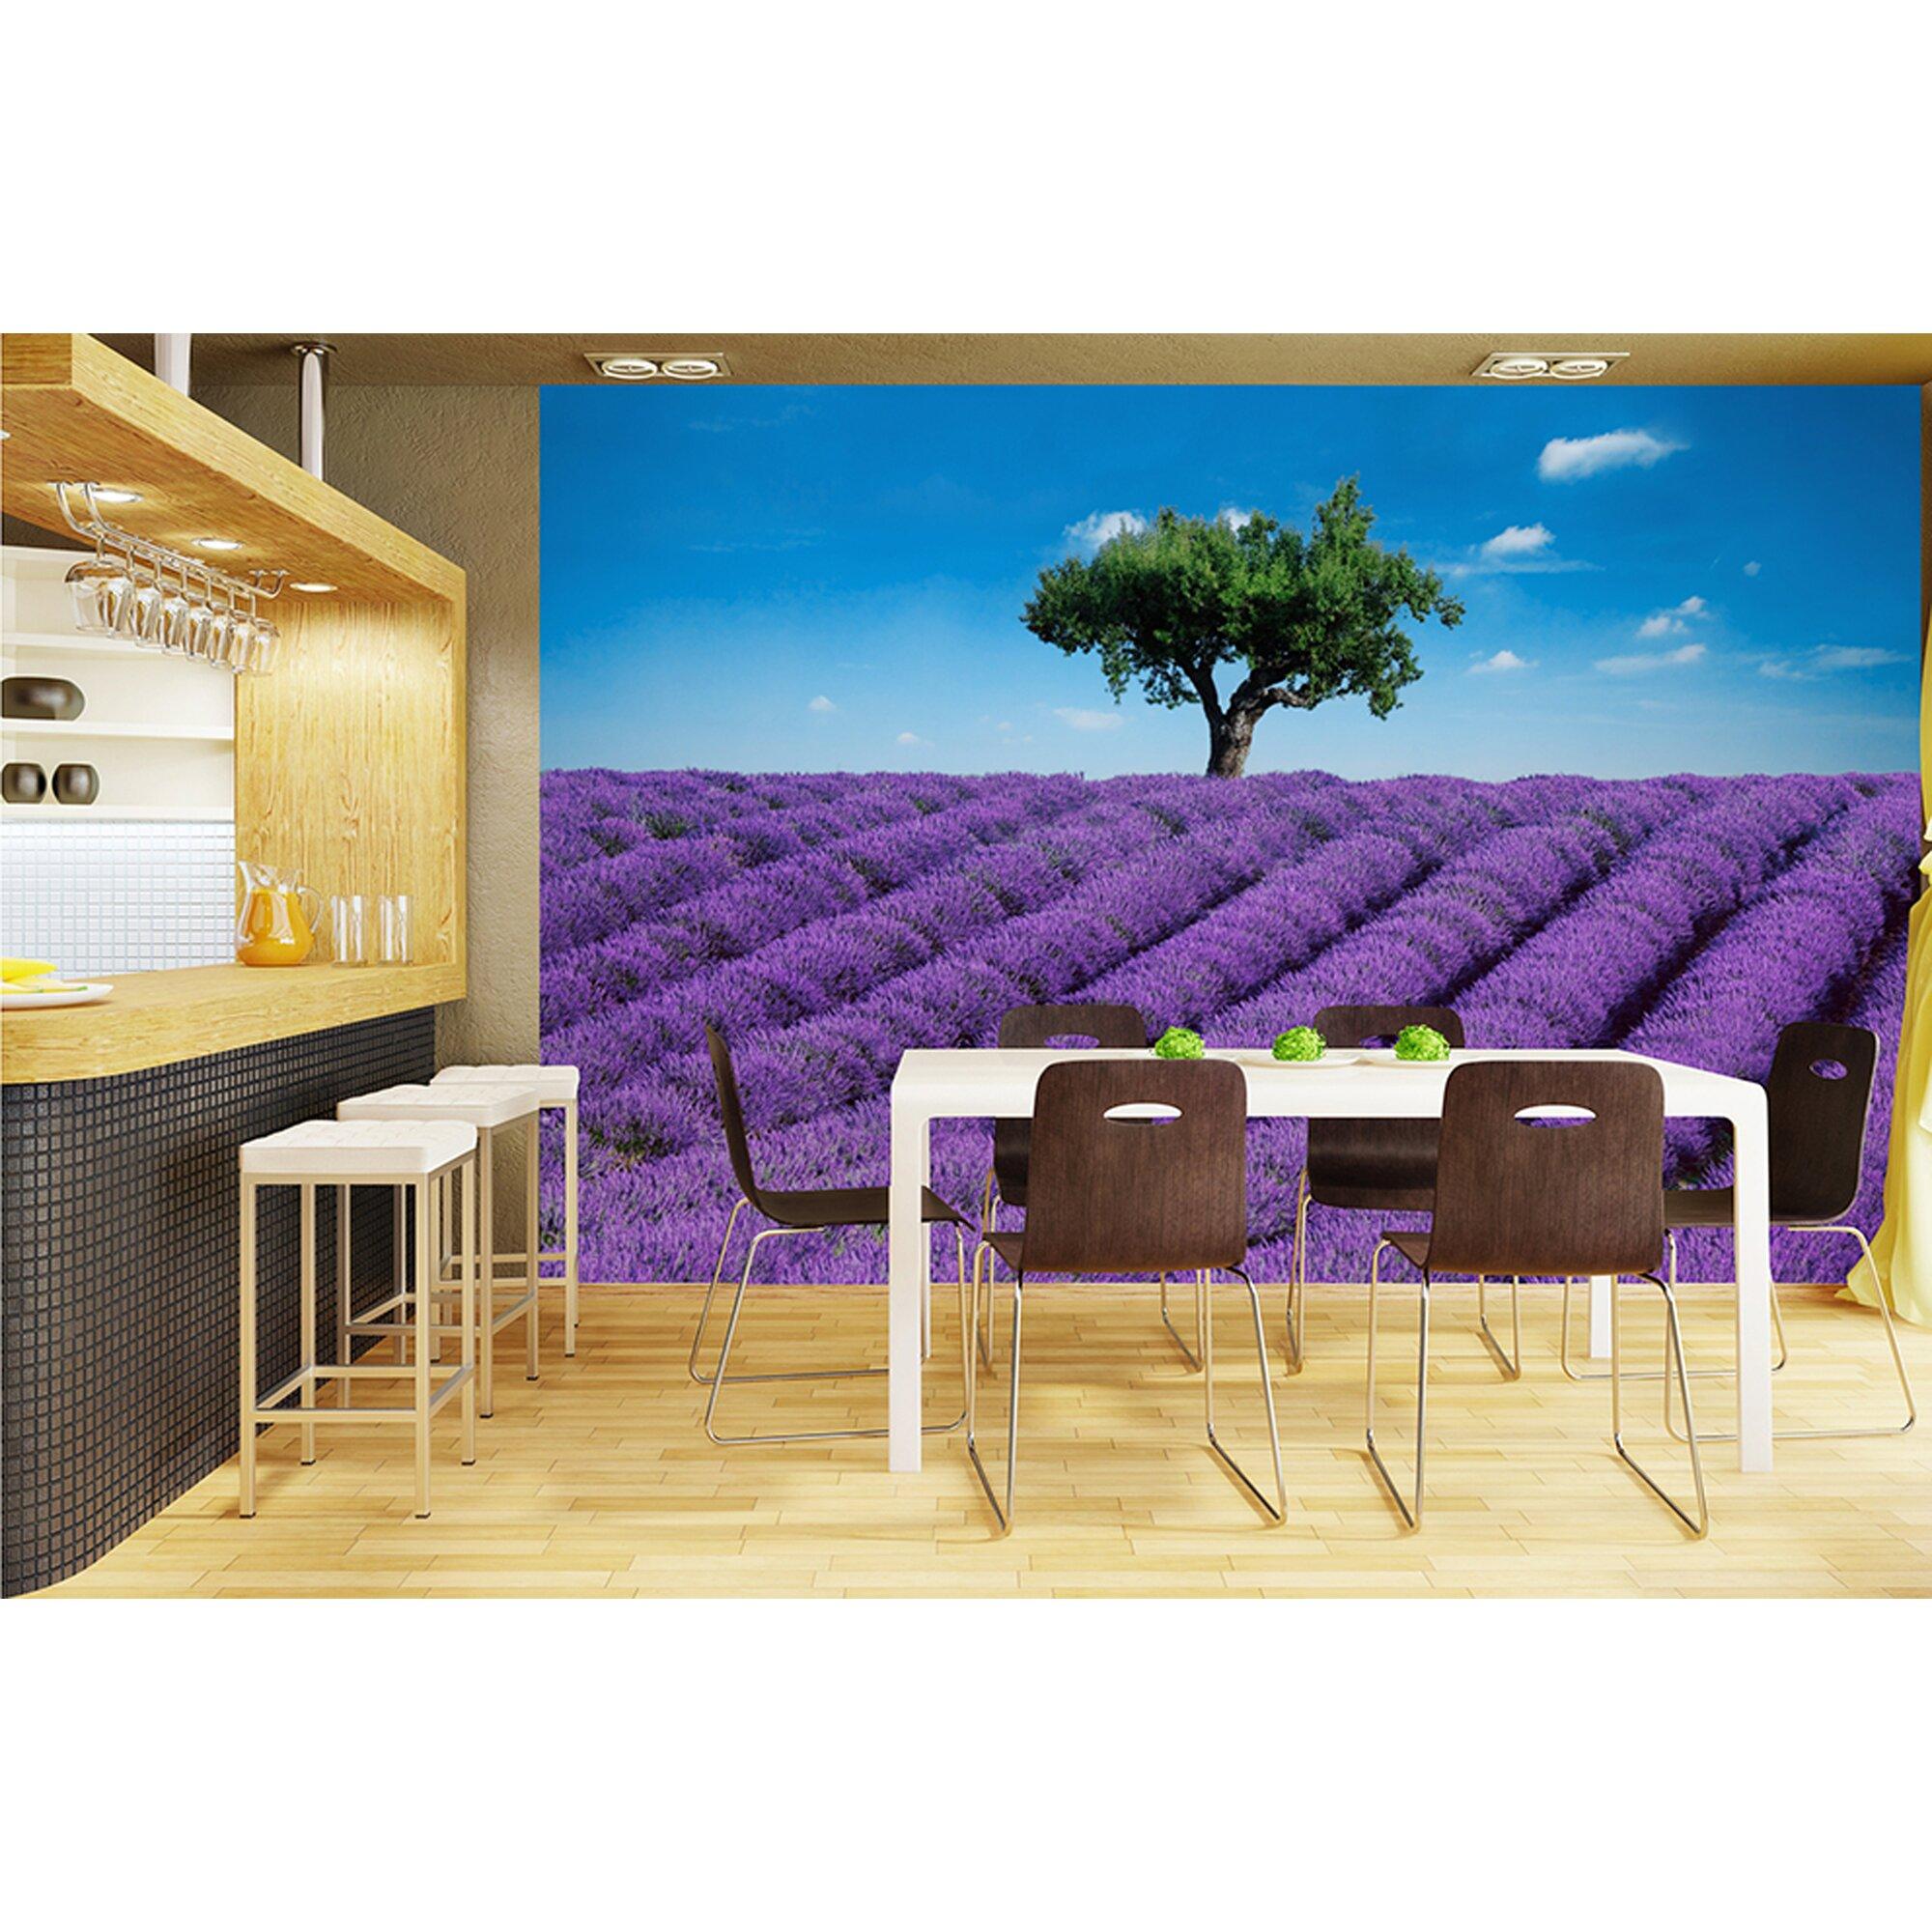 28 ideal decor wall murals ideal decor moscow twilight wall brewster home fashions ideal decor provence wall mural wayfair ca